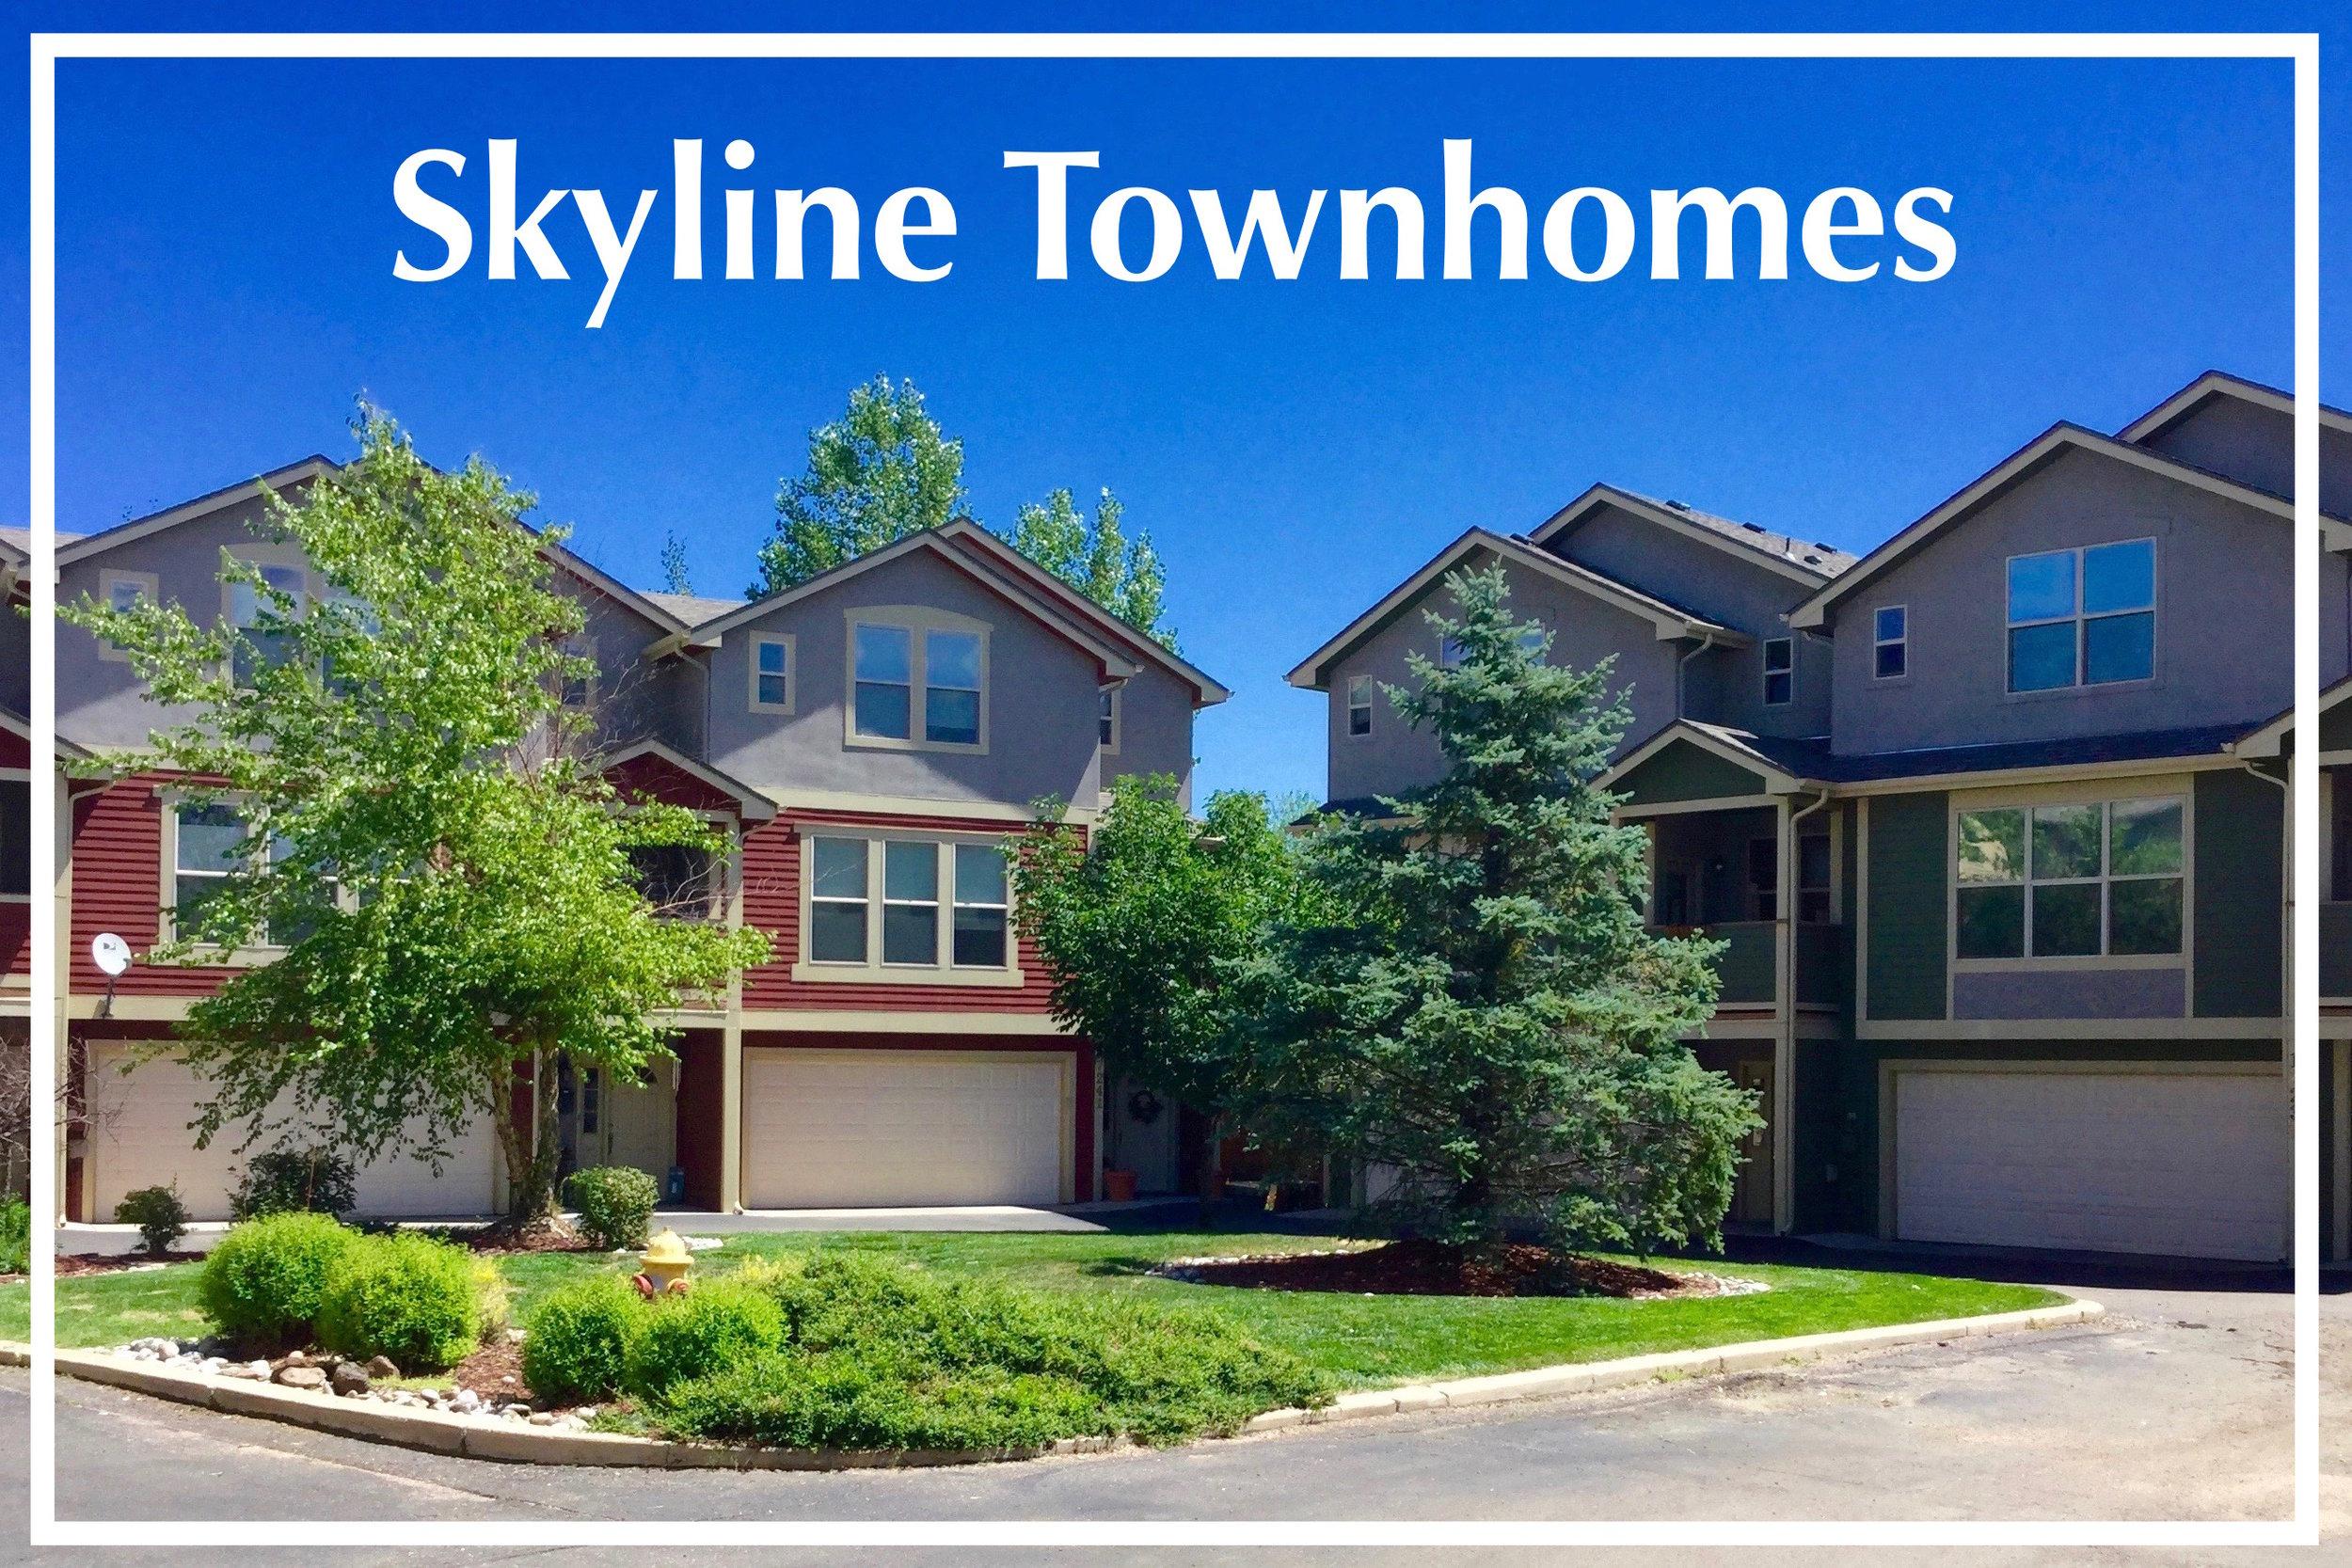 Slyline Townhomes.jpg